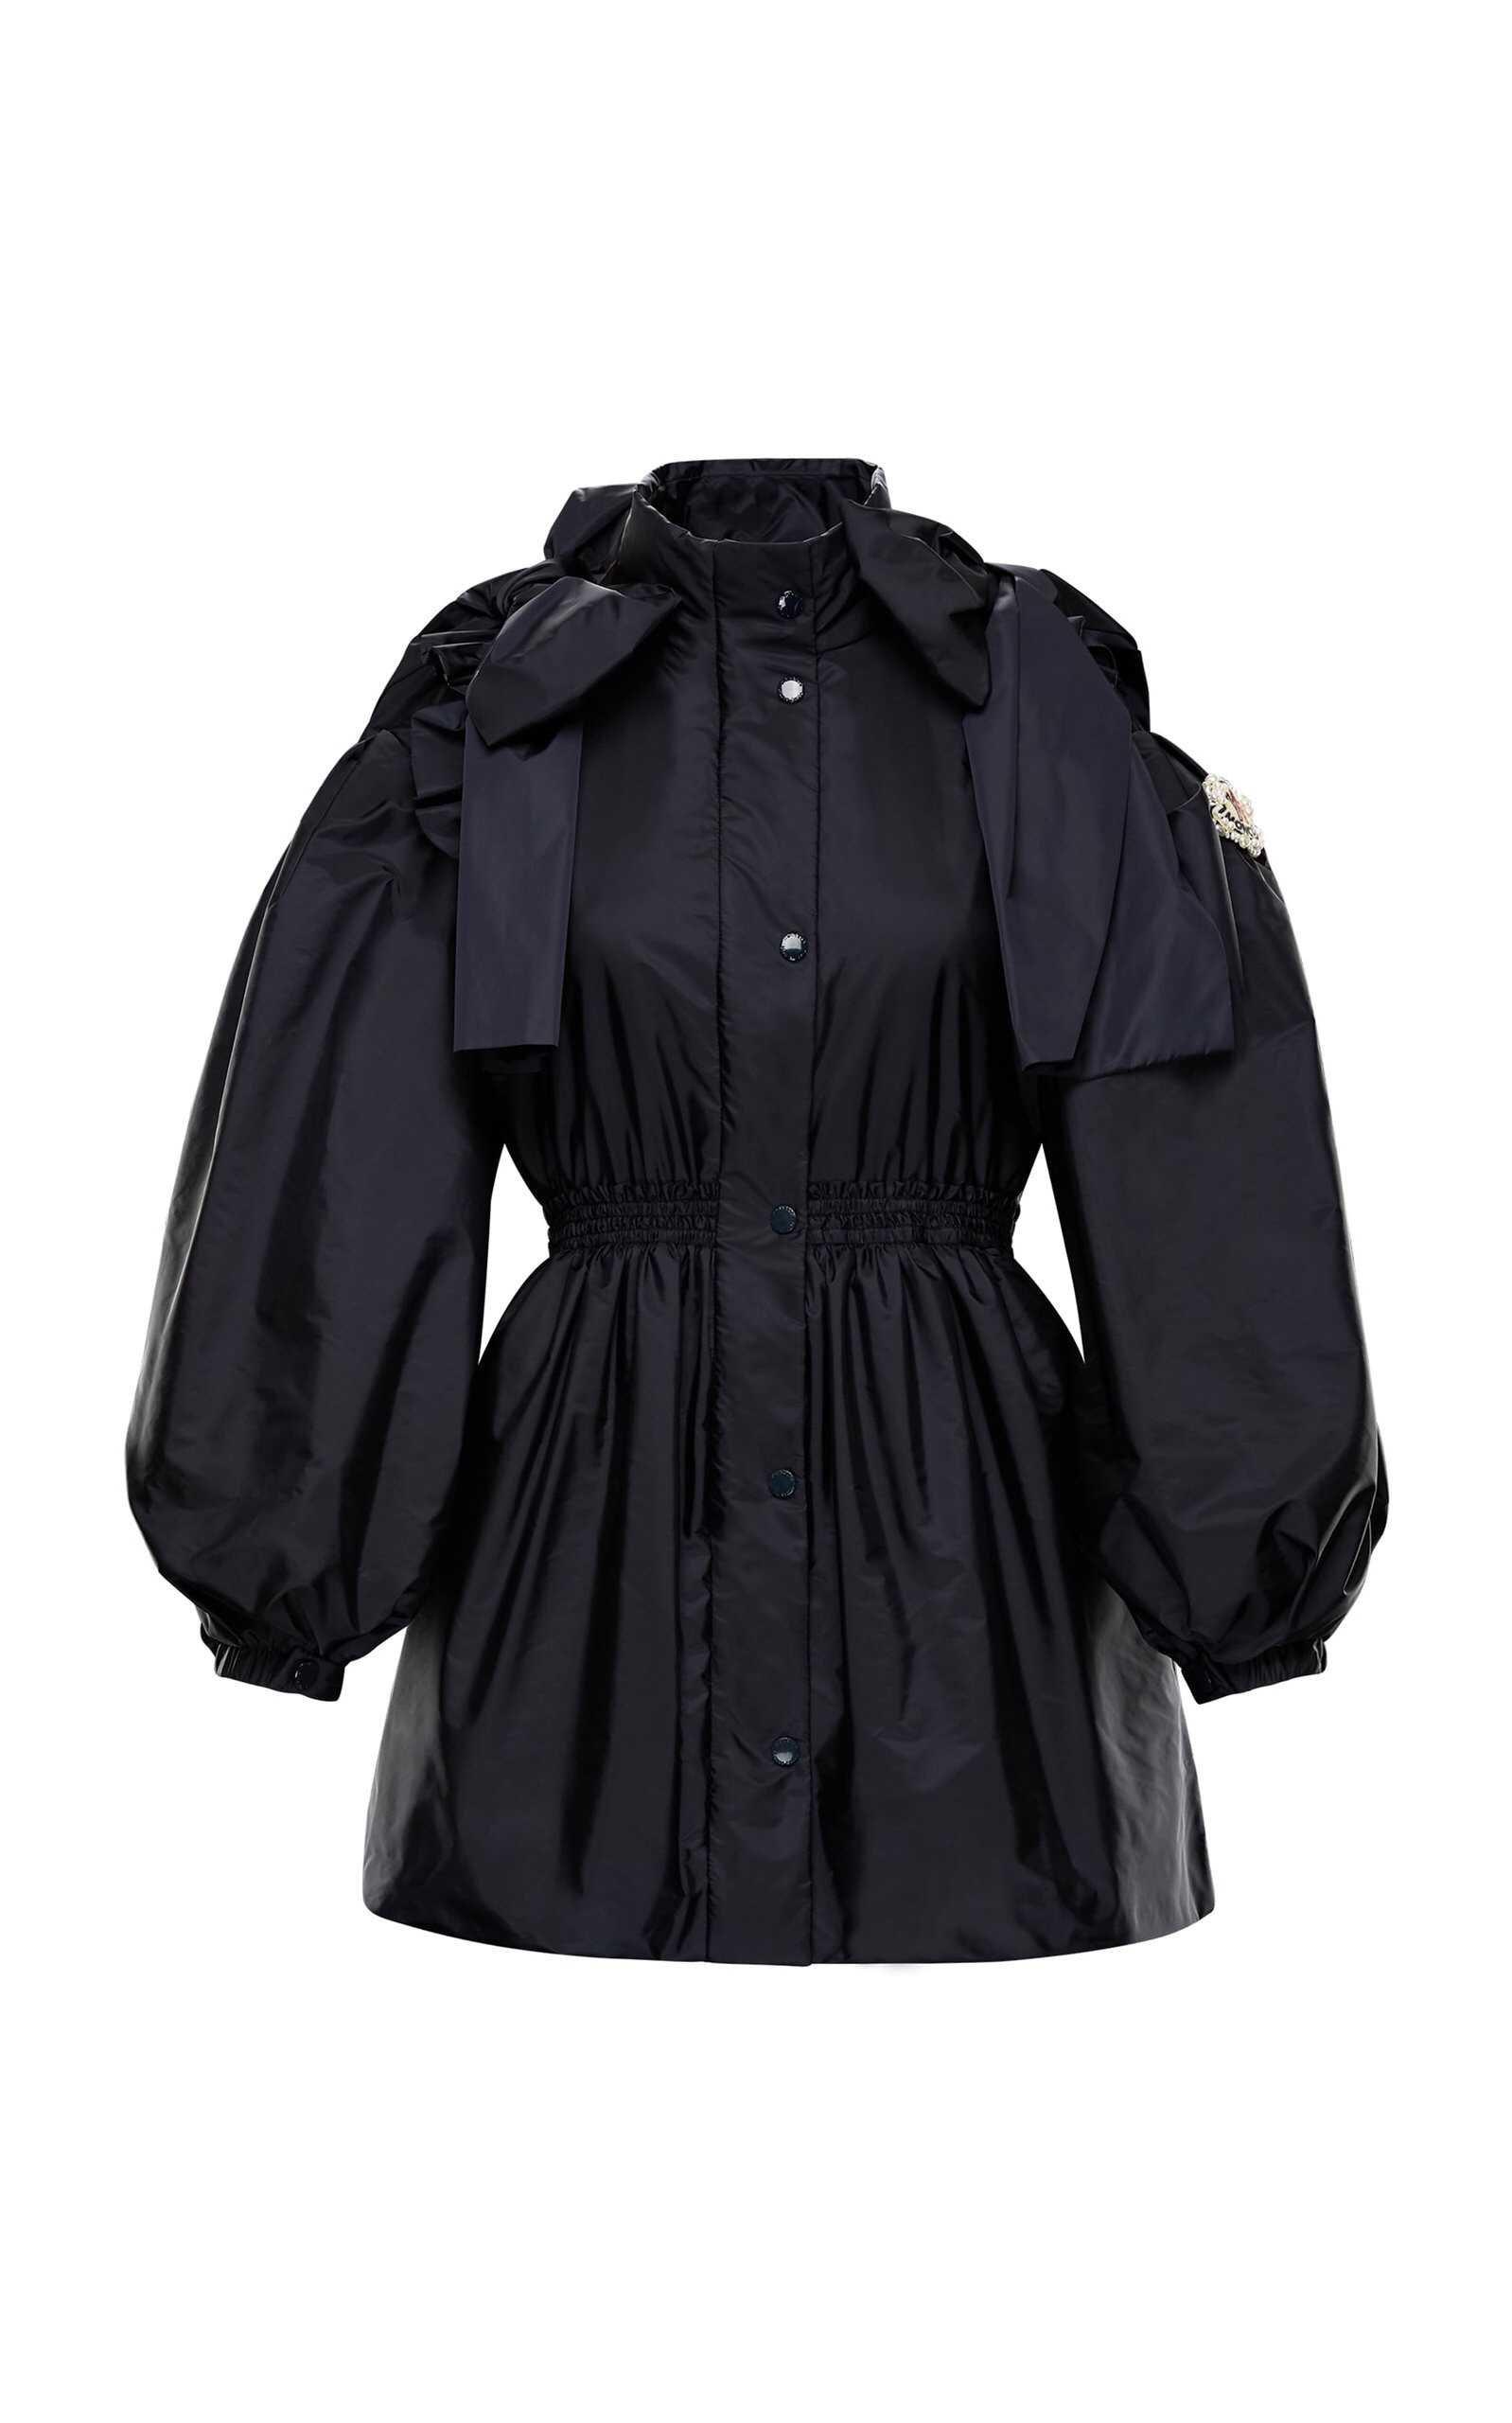 Moncler 4 Simone Rocha Bow-Detailed Shell Peplum Jacket